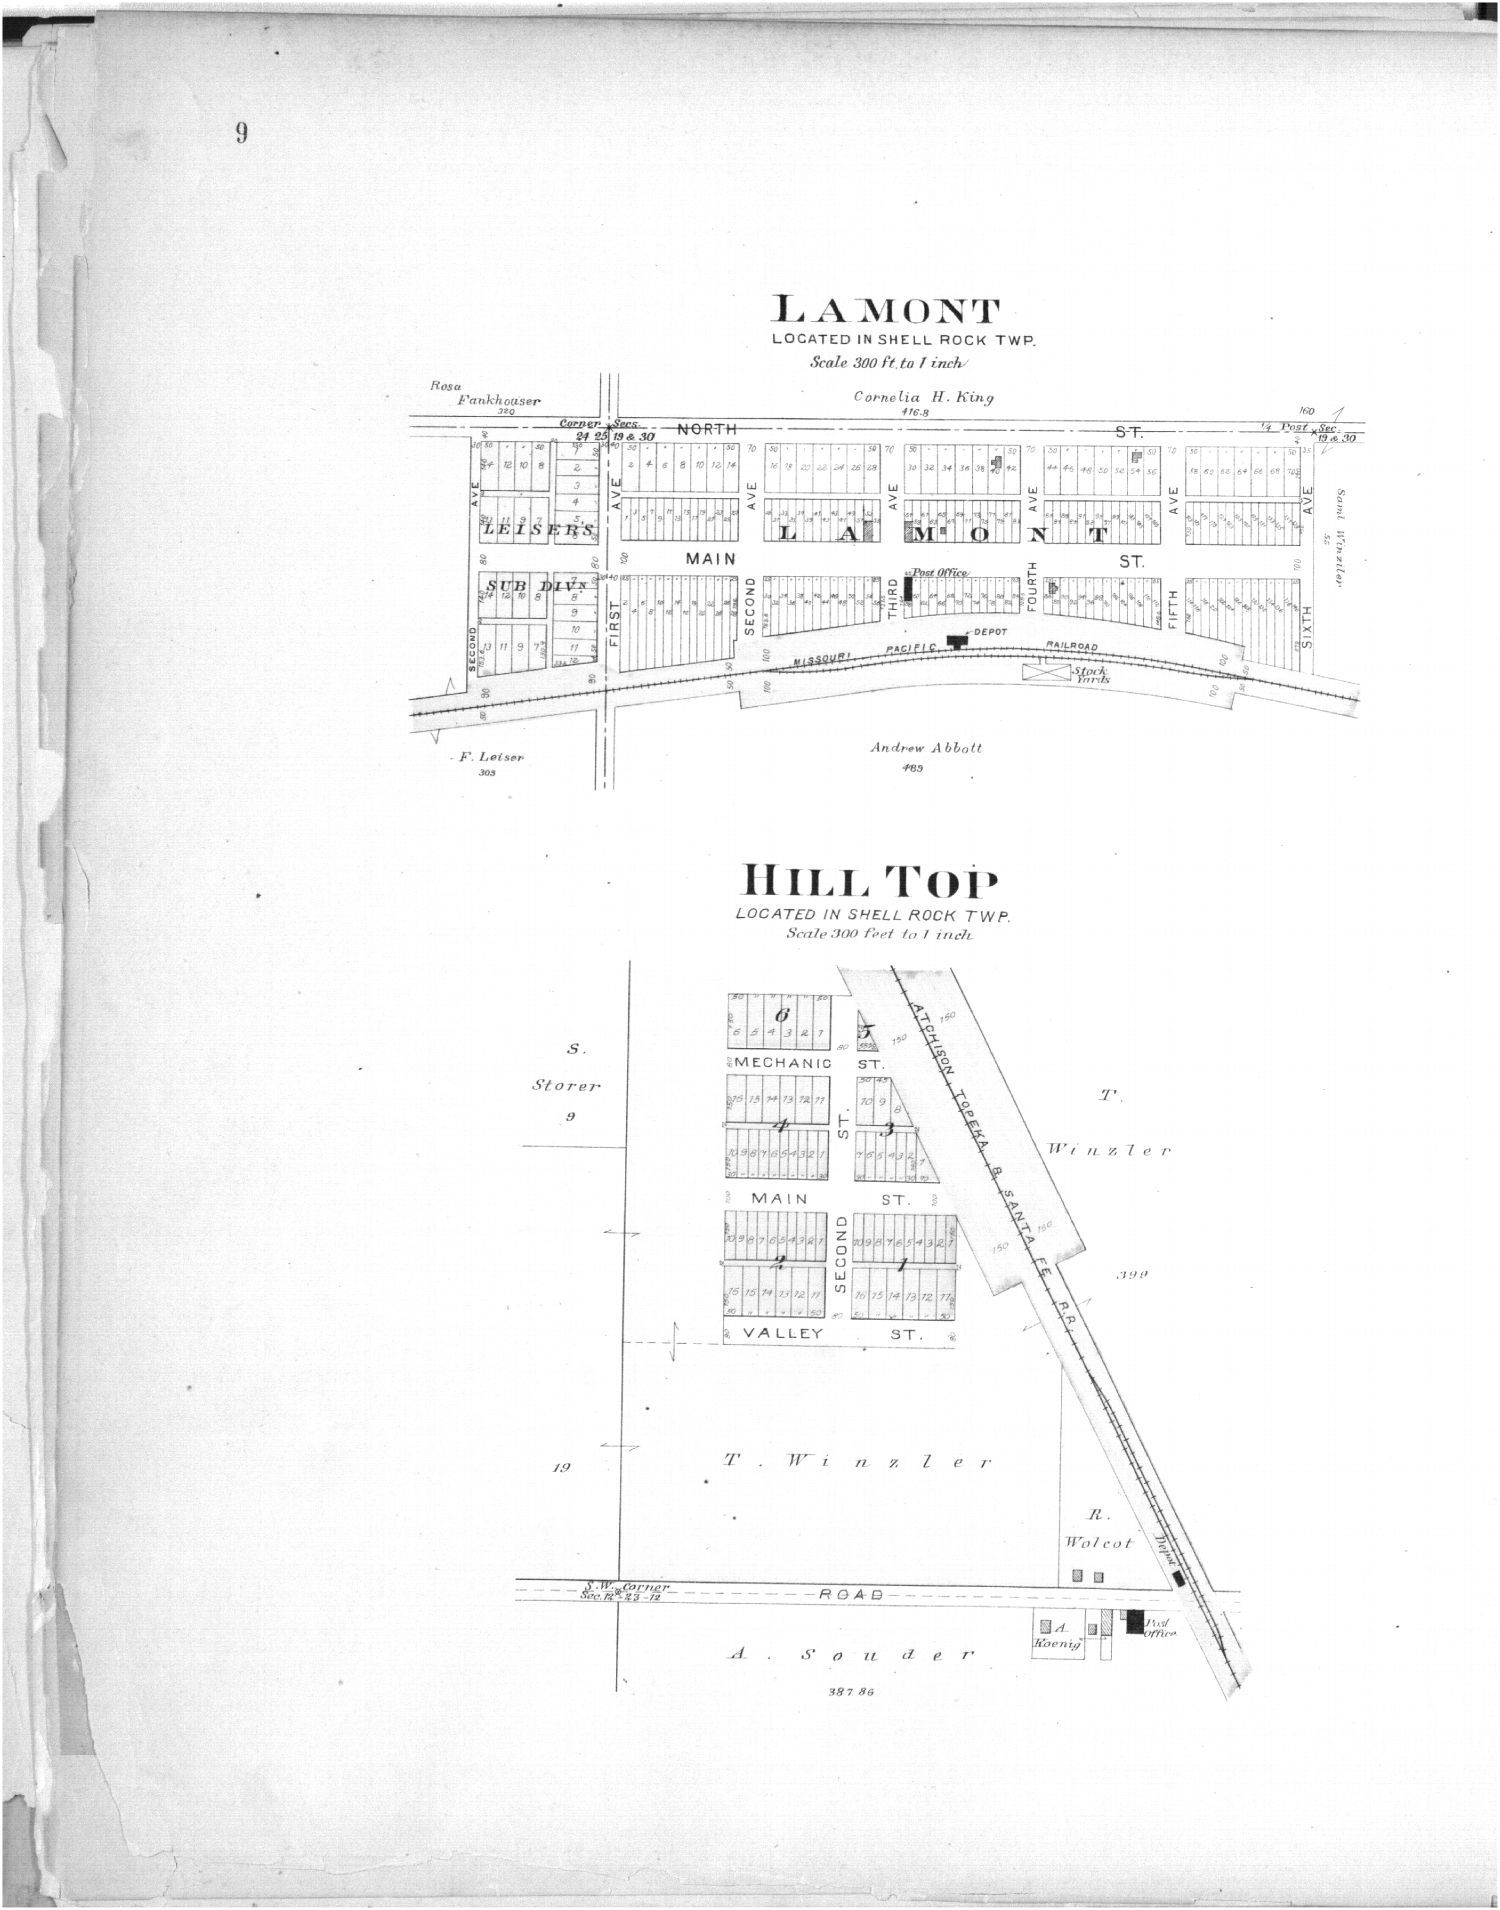 Plat book of Greenwood County, Kansas - 9